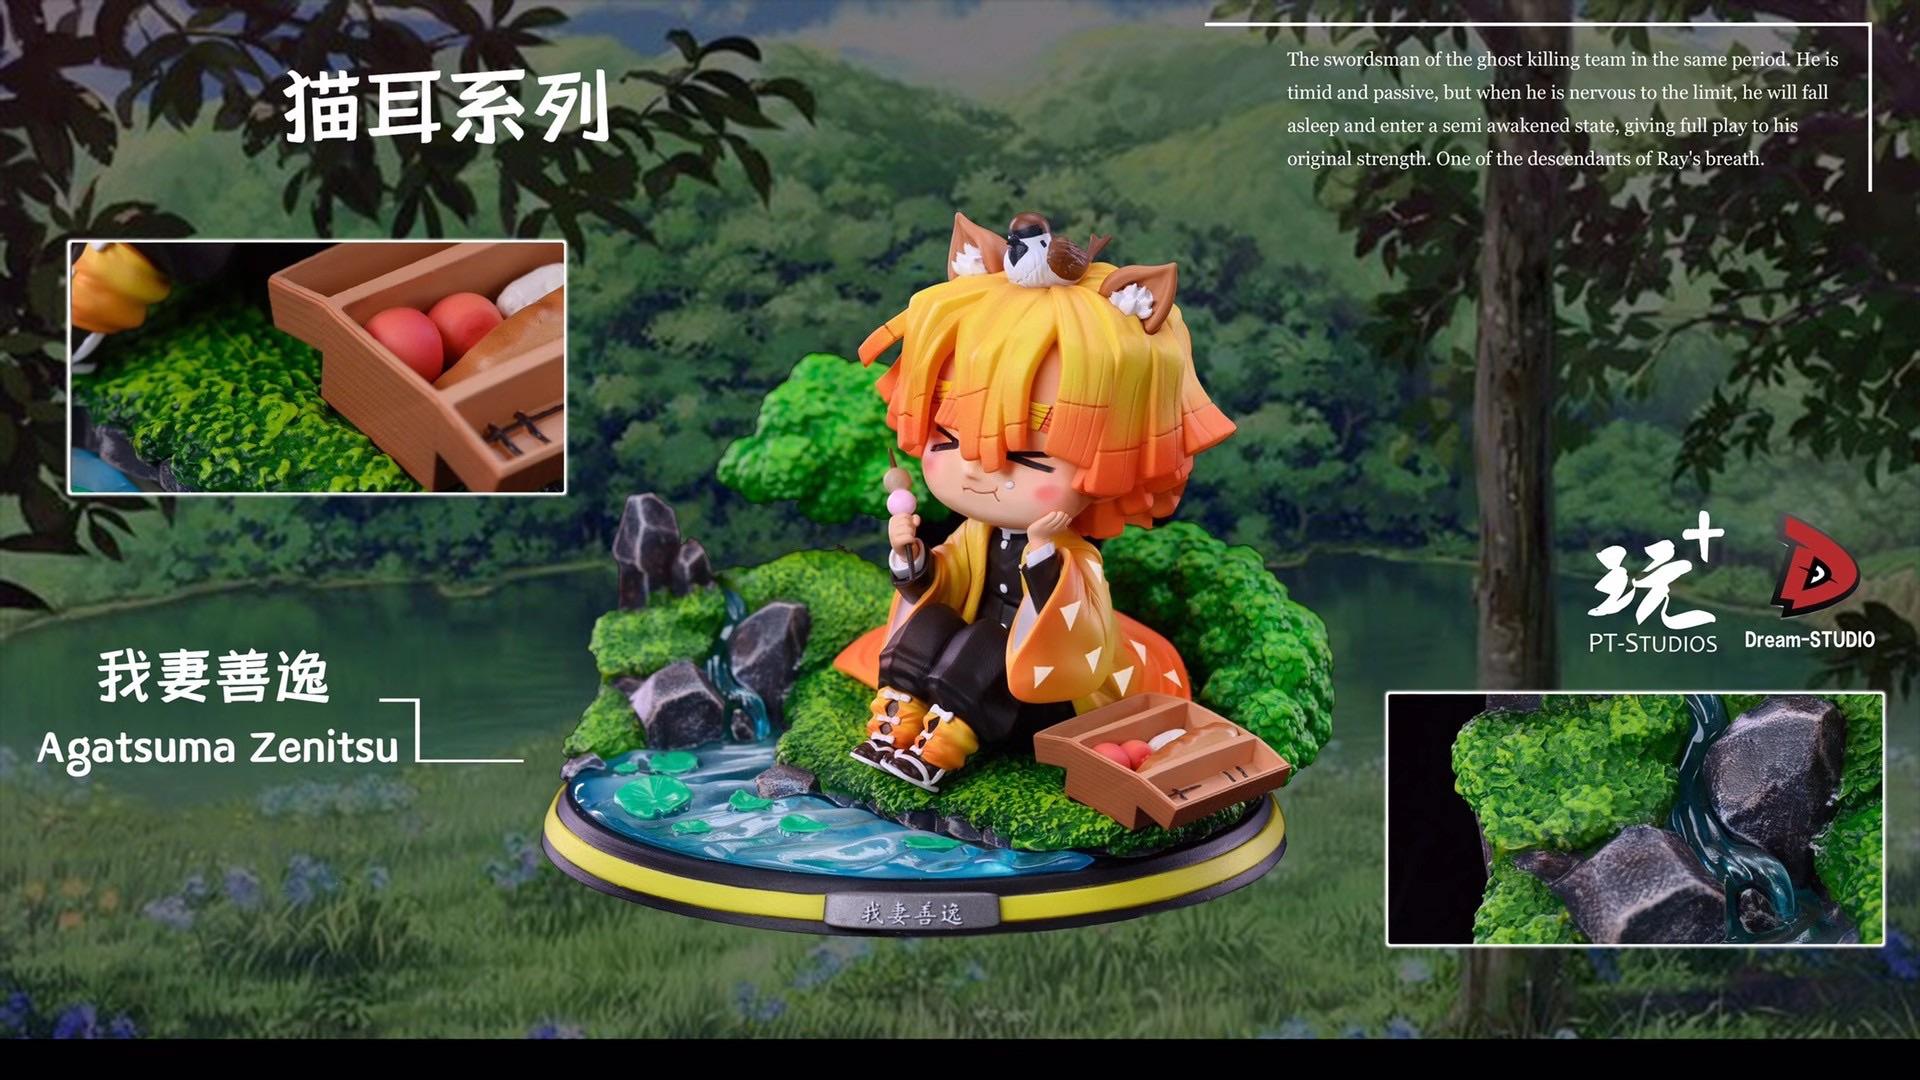 Zenitsu เซนอิทซึ ดังโงะ PT X Dream Studio (มัดจำ)